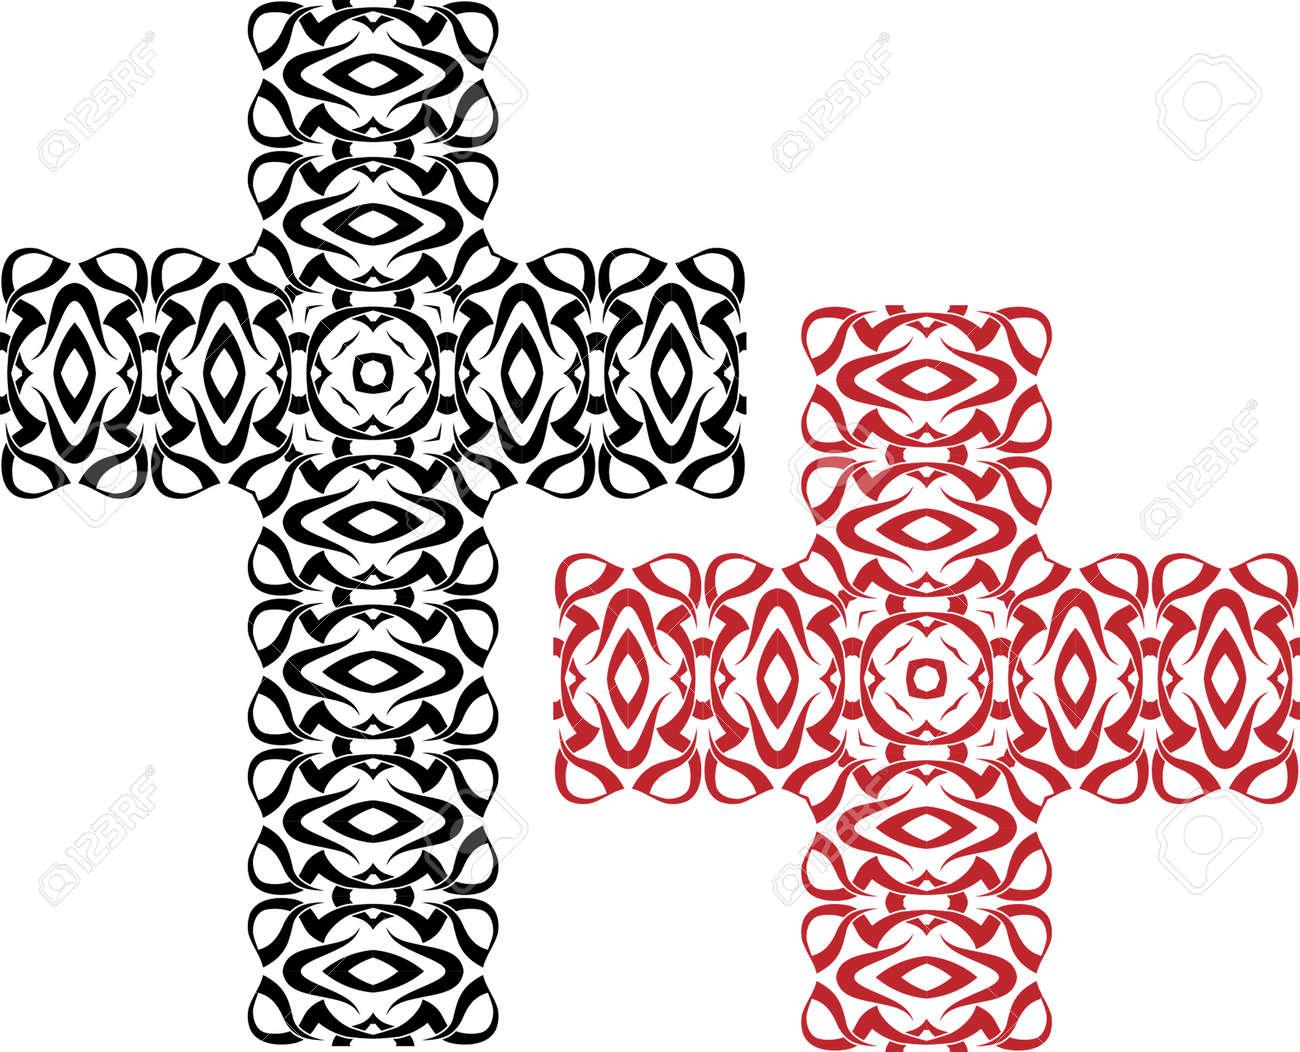 Christian Cross Design Vector Art Royalty Free Cliparts, Vectors ...